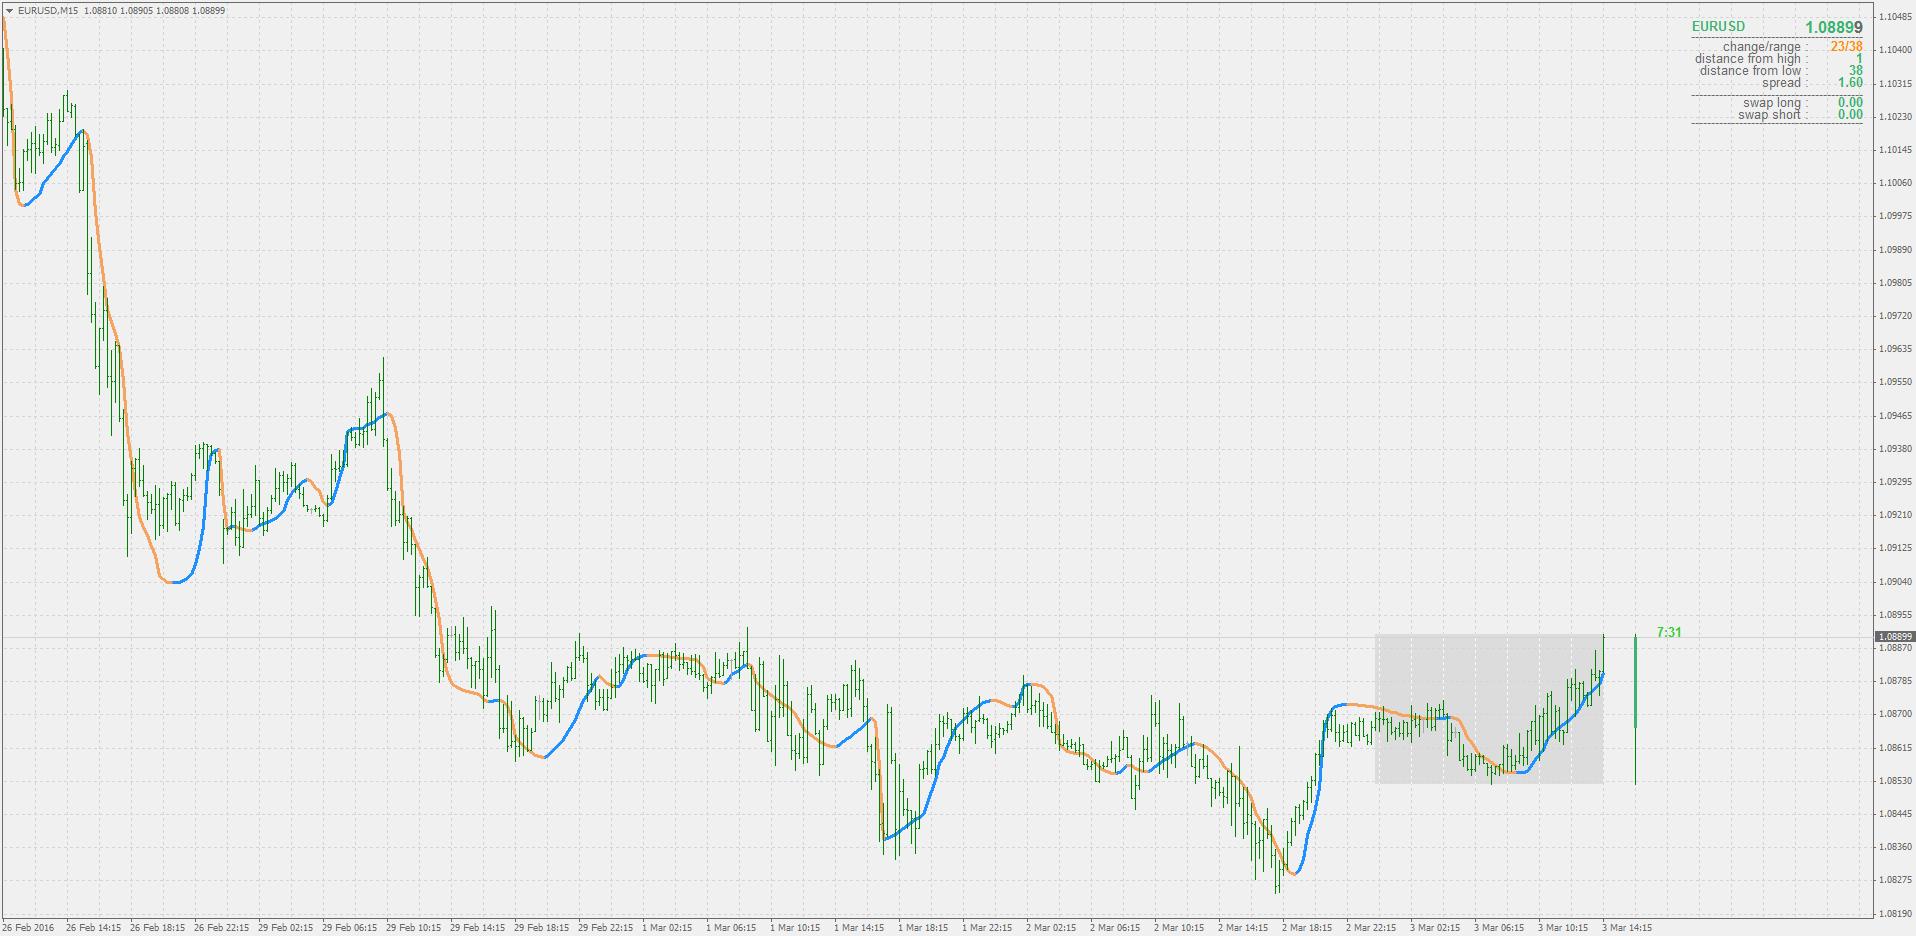 Vhf indicator forex